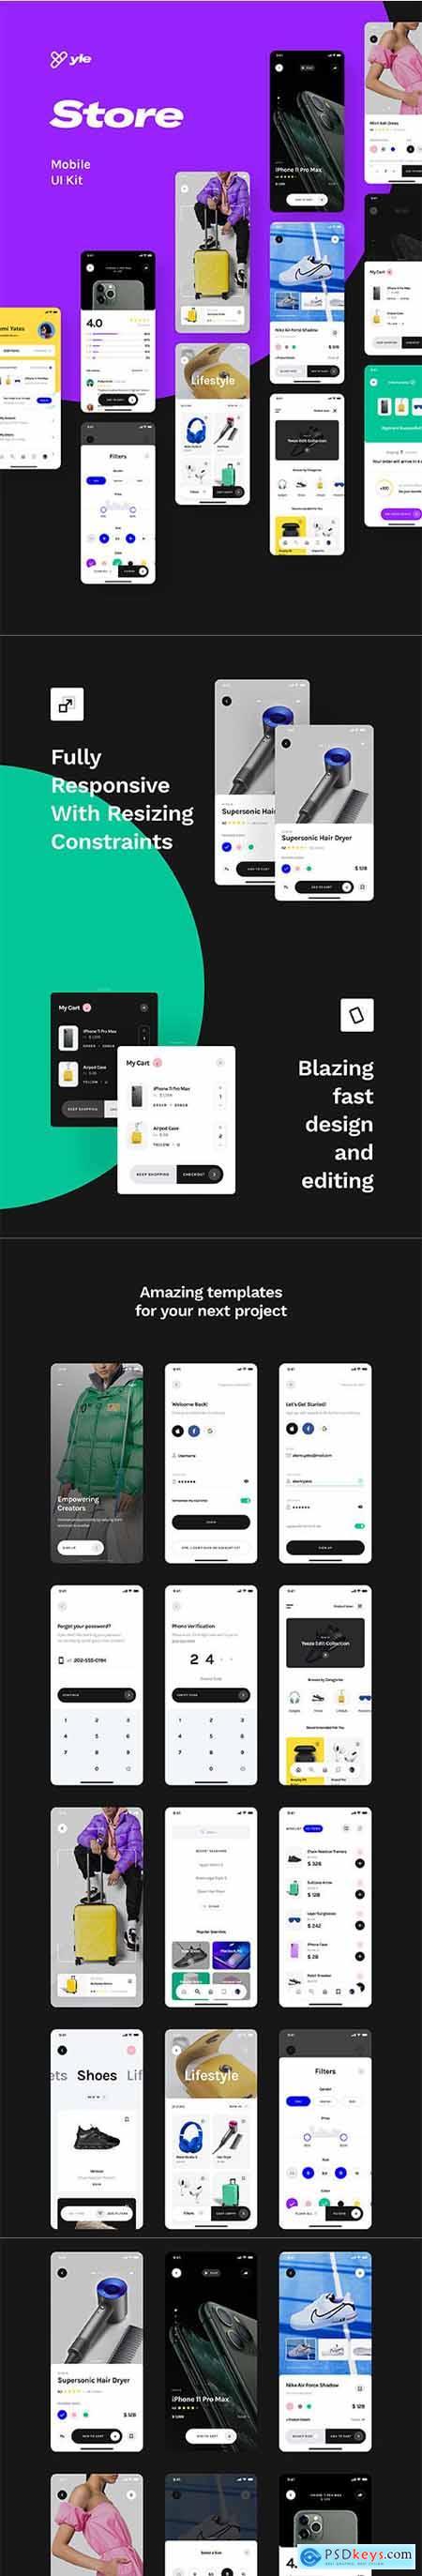 Yle Store Figma UI Kit